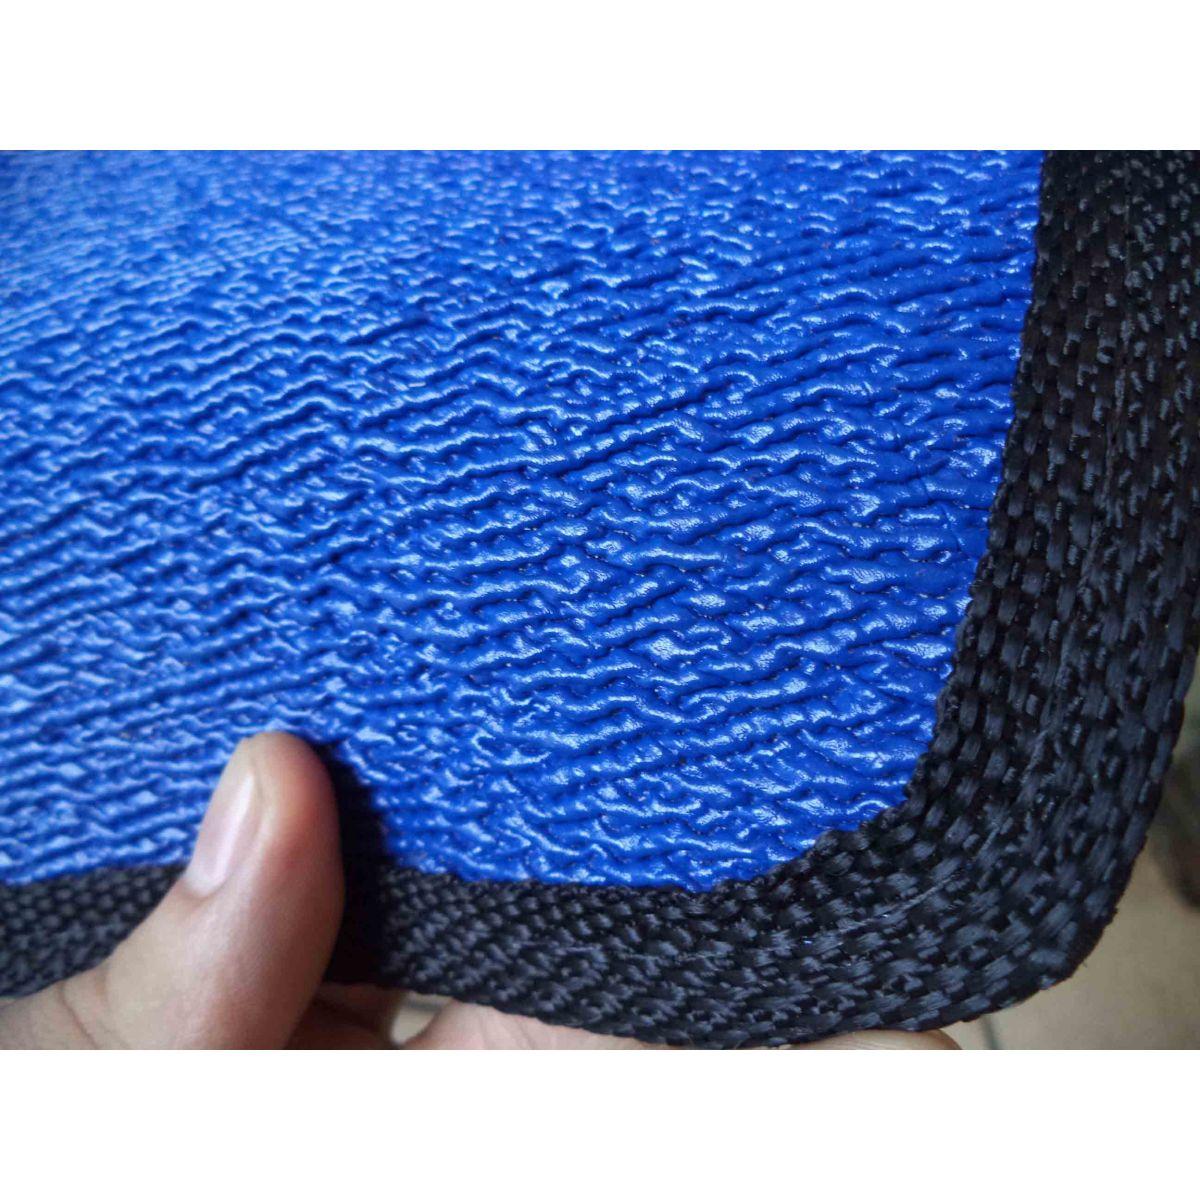 Jogo Tapete Automotivo Carro Fiat 500 Tempra Stilo Azul